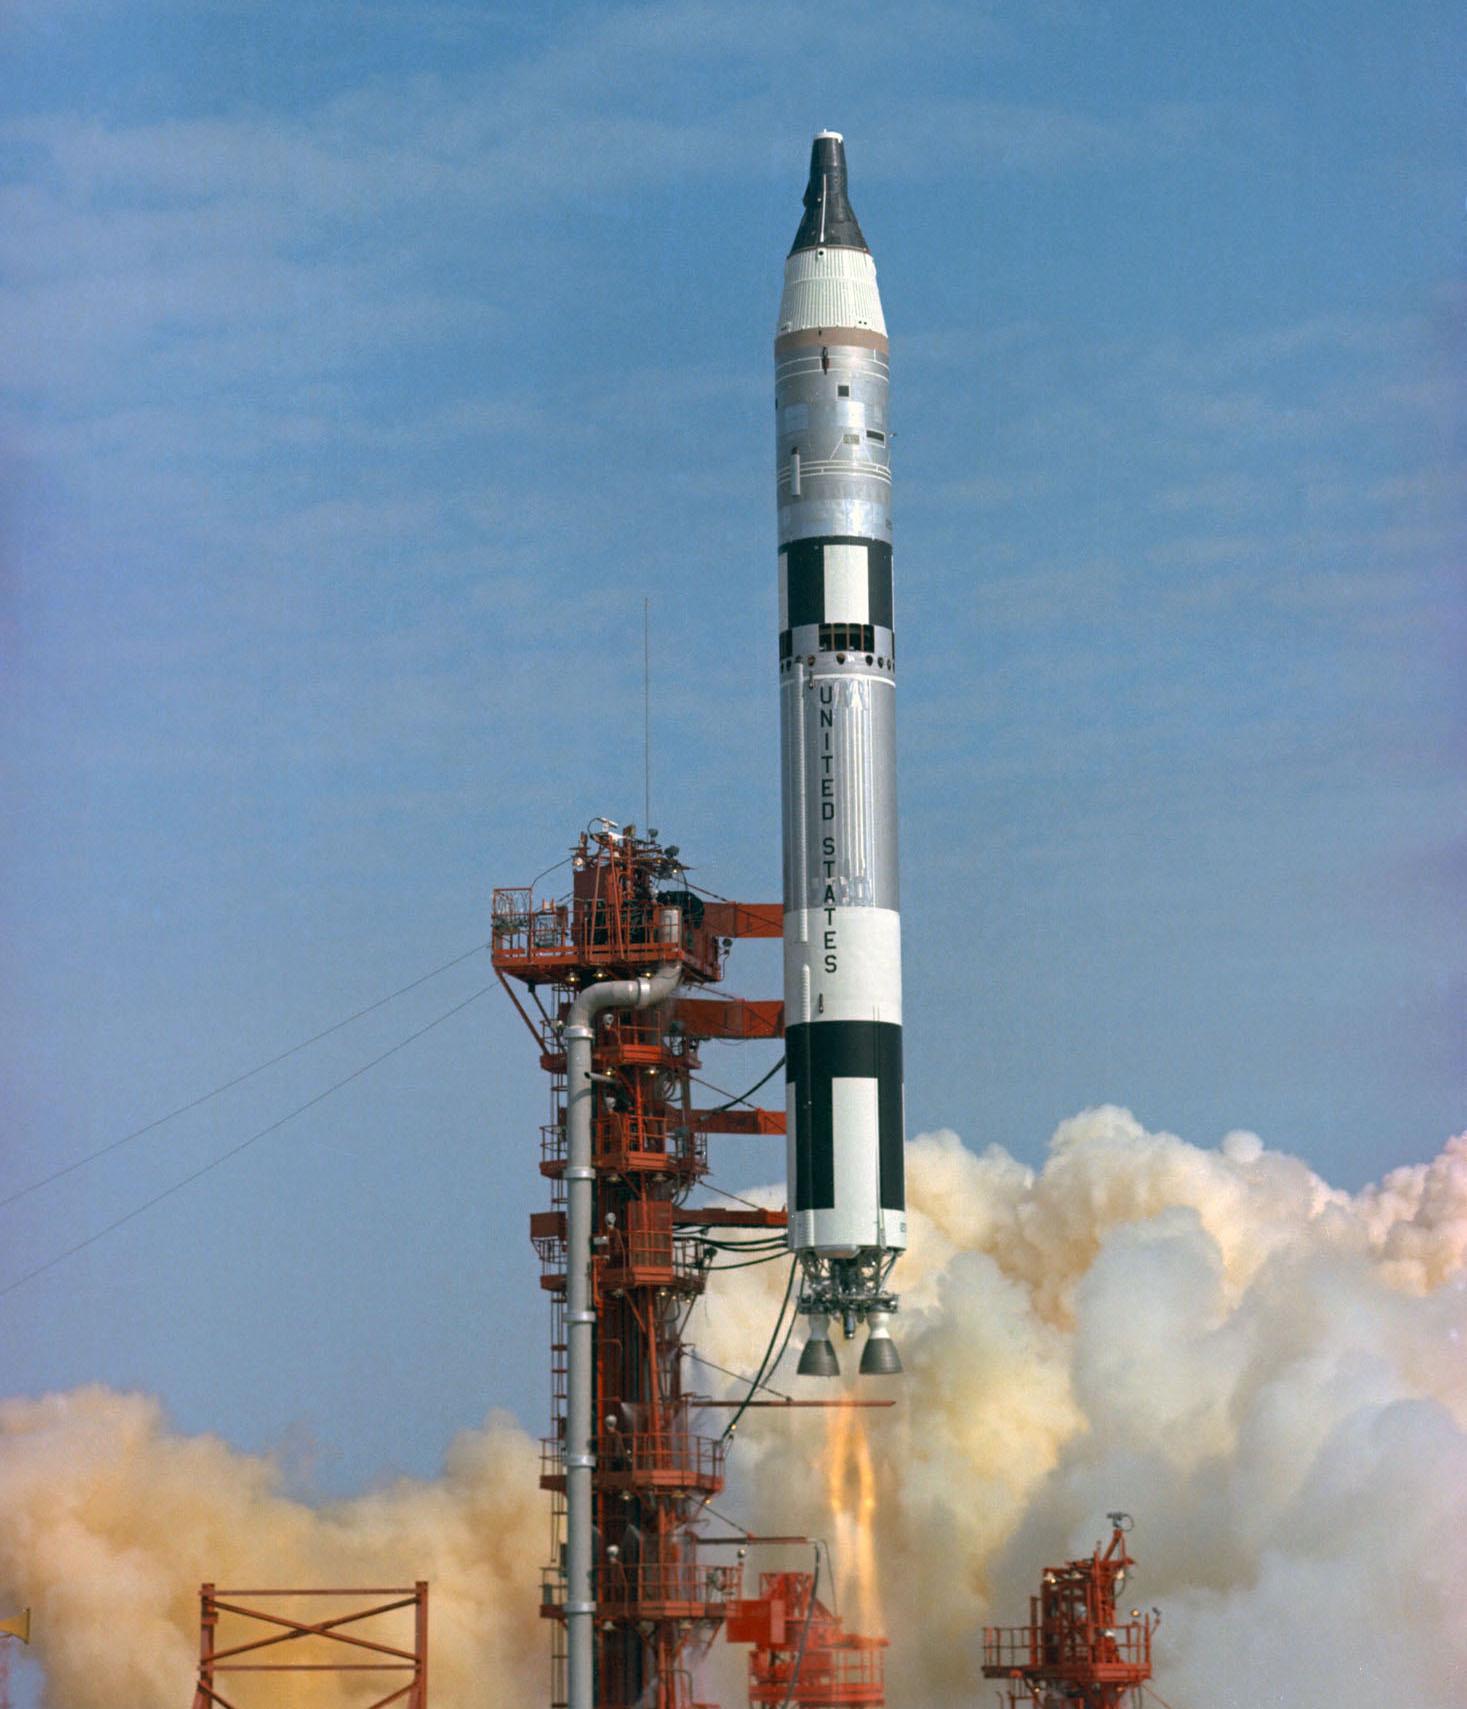 Gemini Space Program Rocket - Pics about space